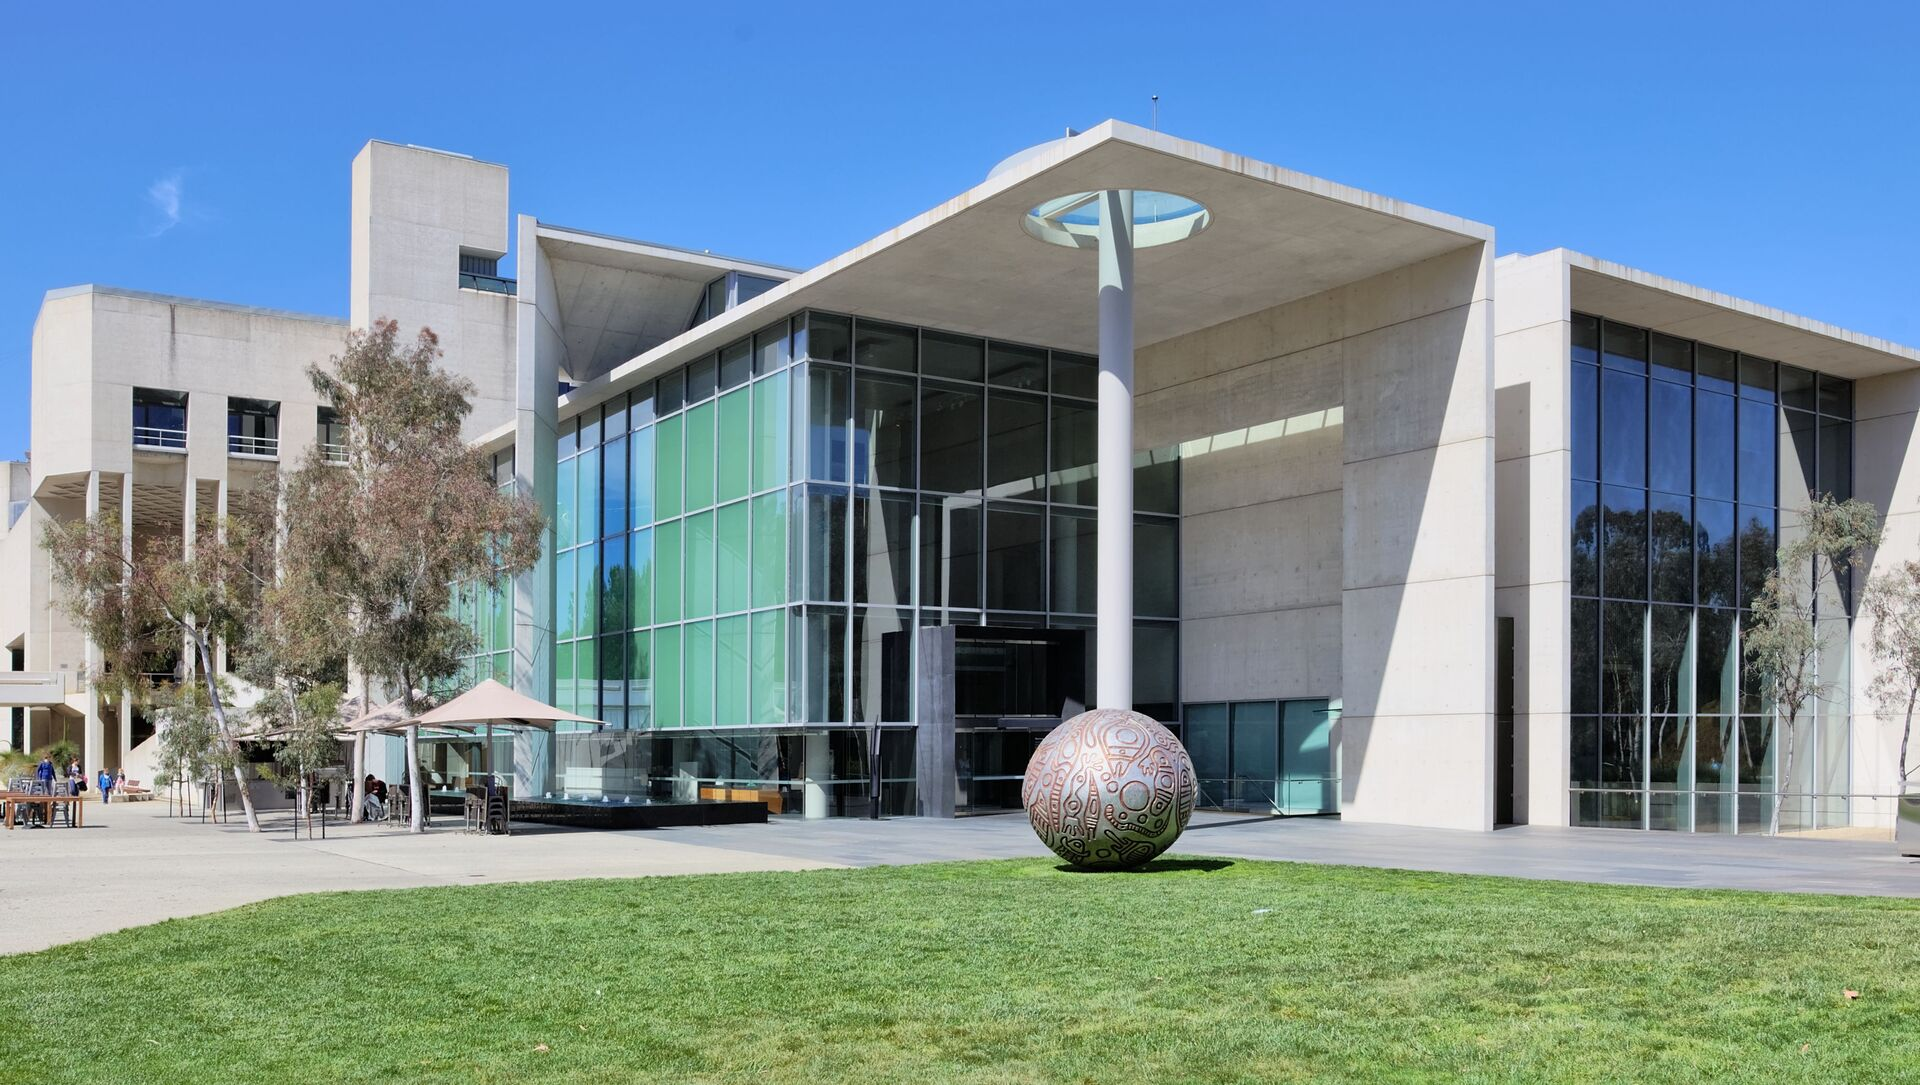 National Gallery of Australia - Sputnik International, 1920, 29.07.2021